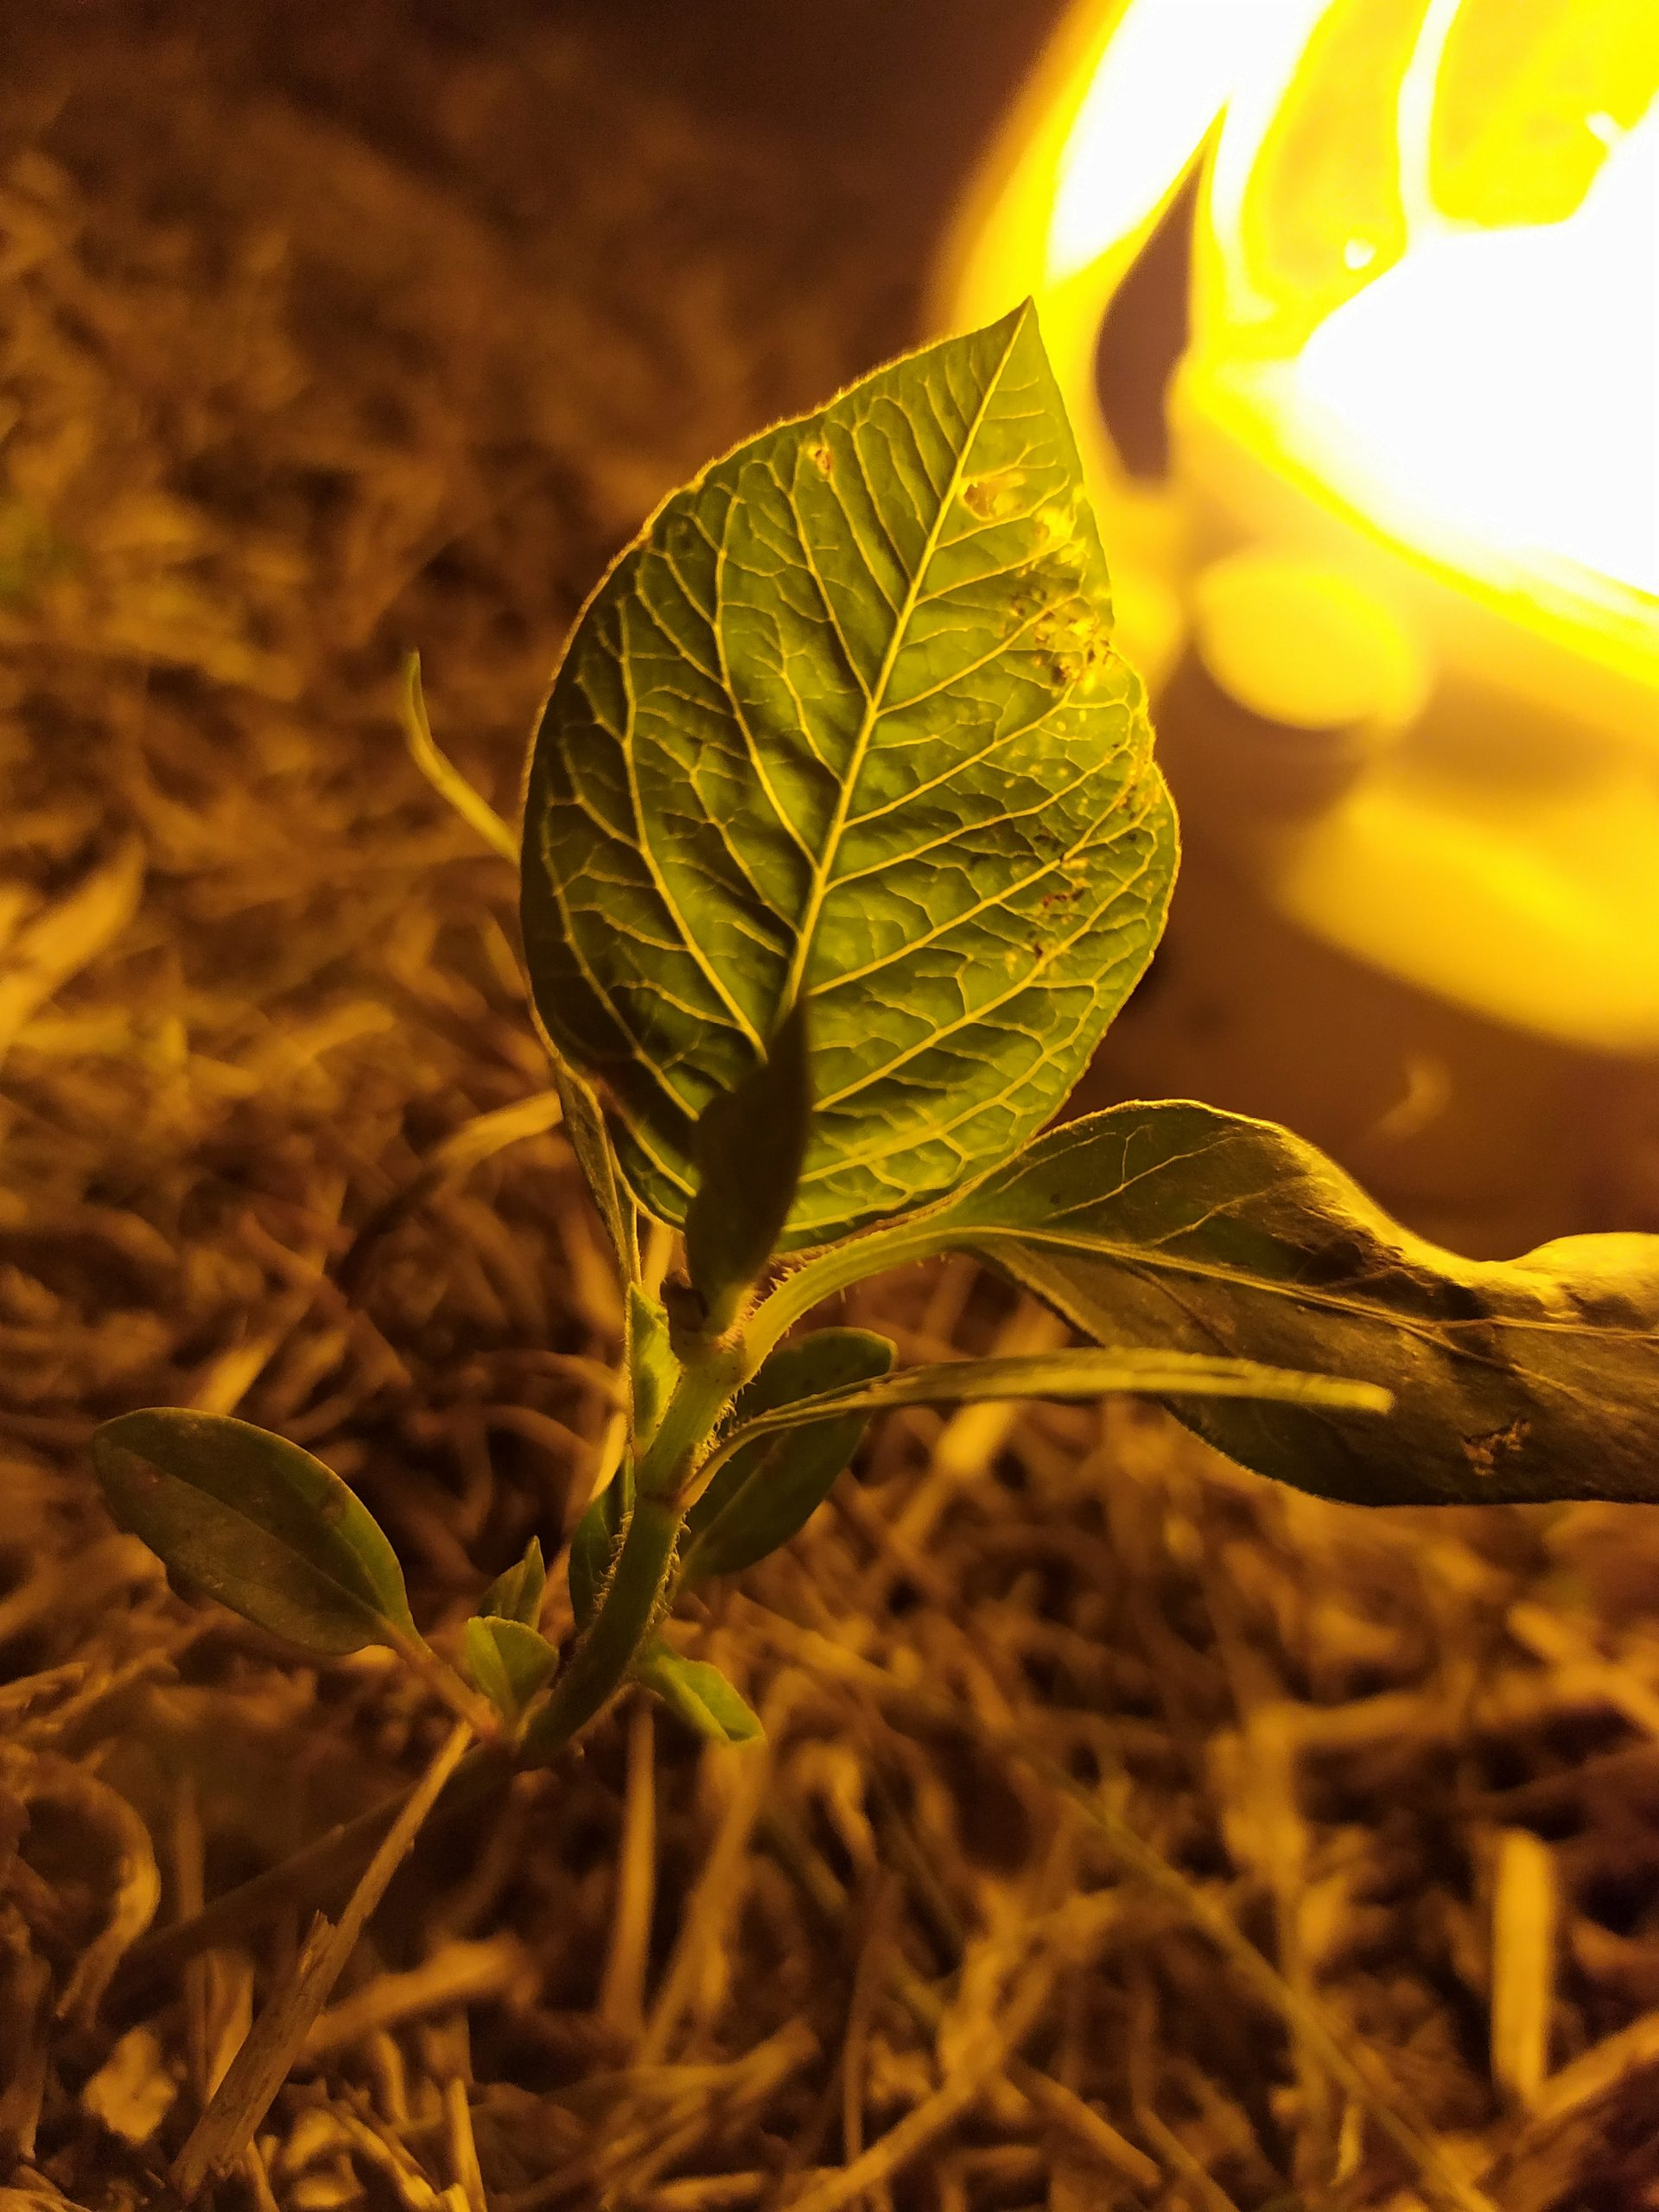 A leaf brightly lit by a lamp